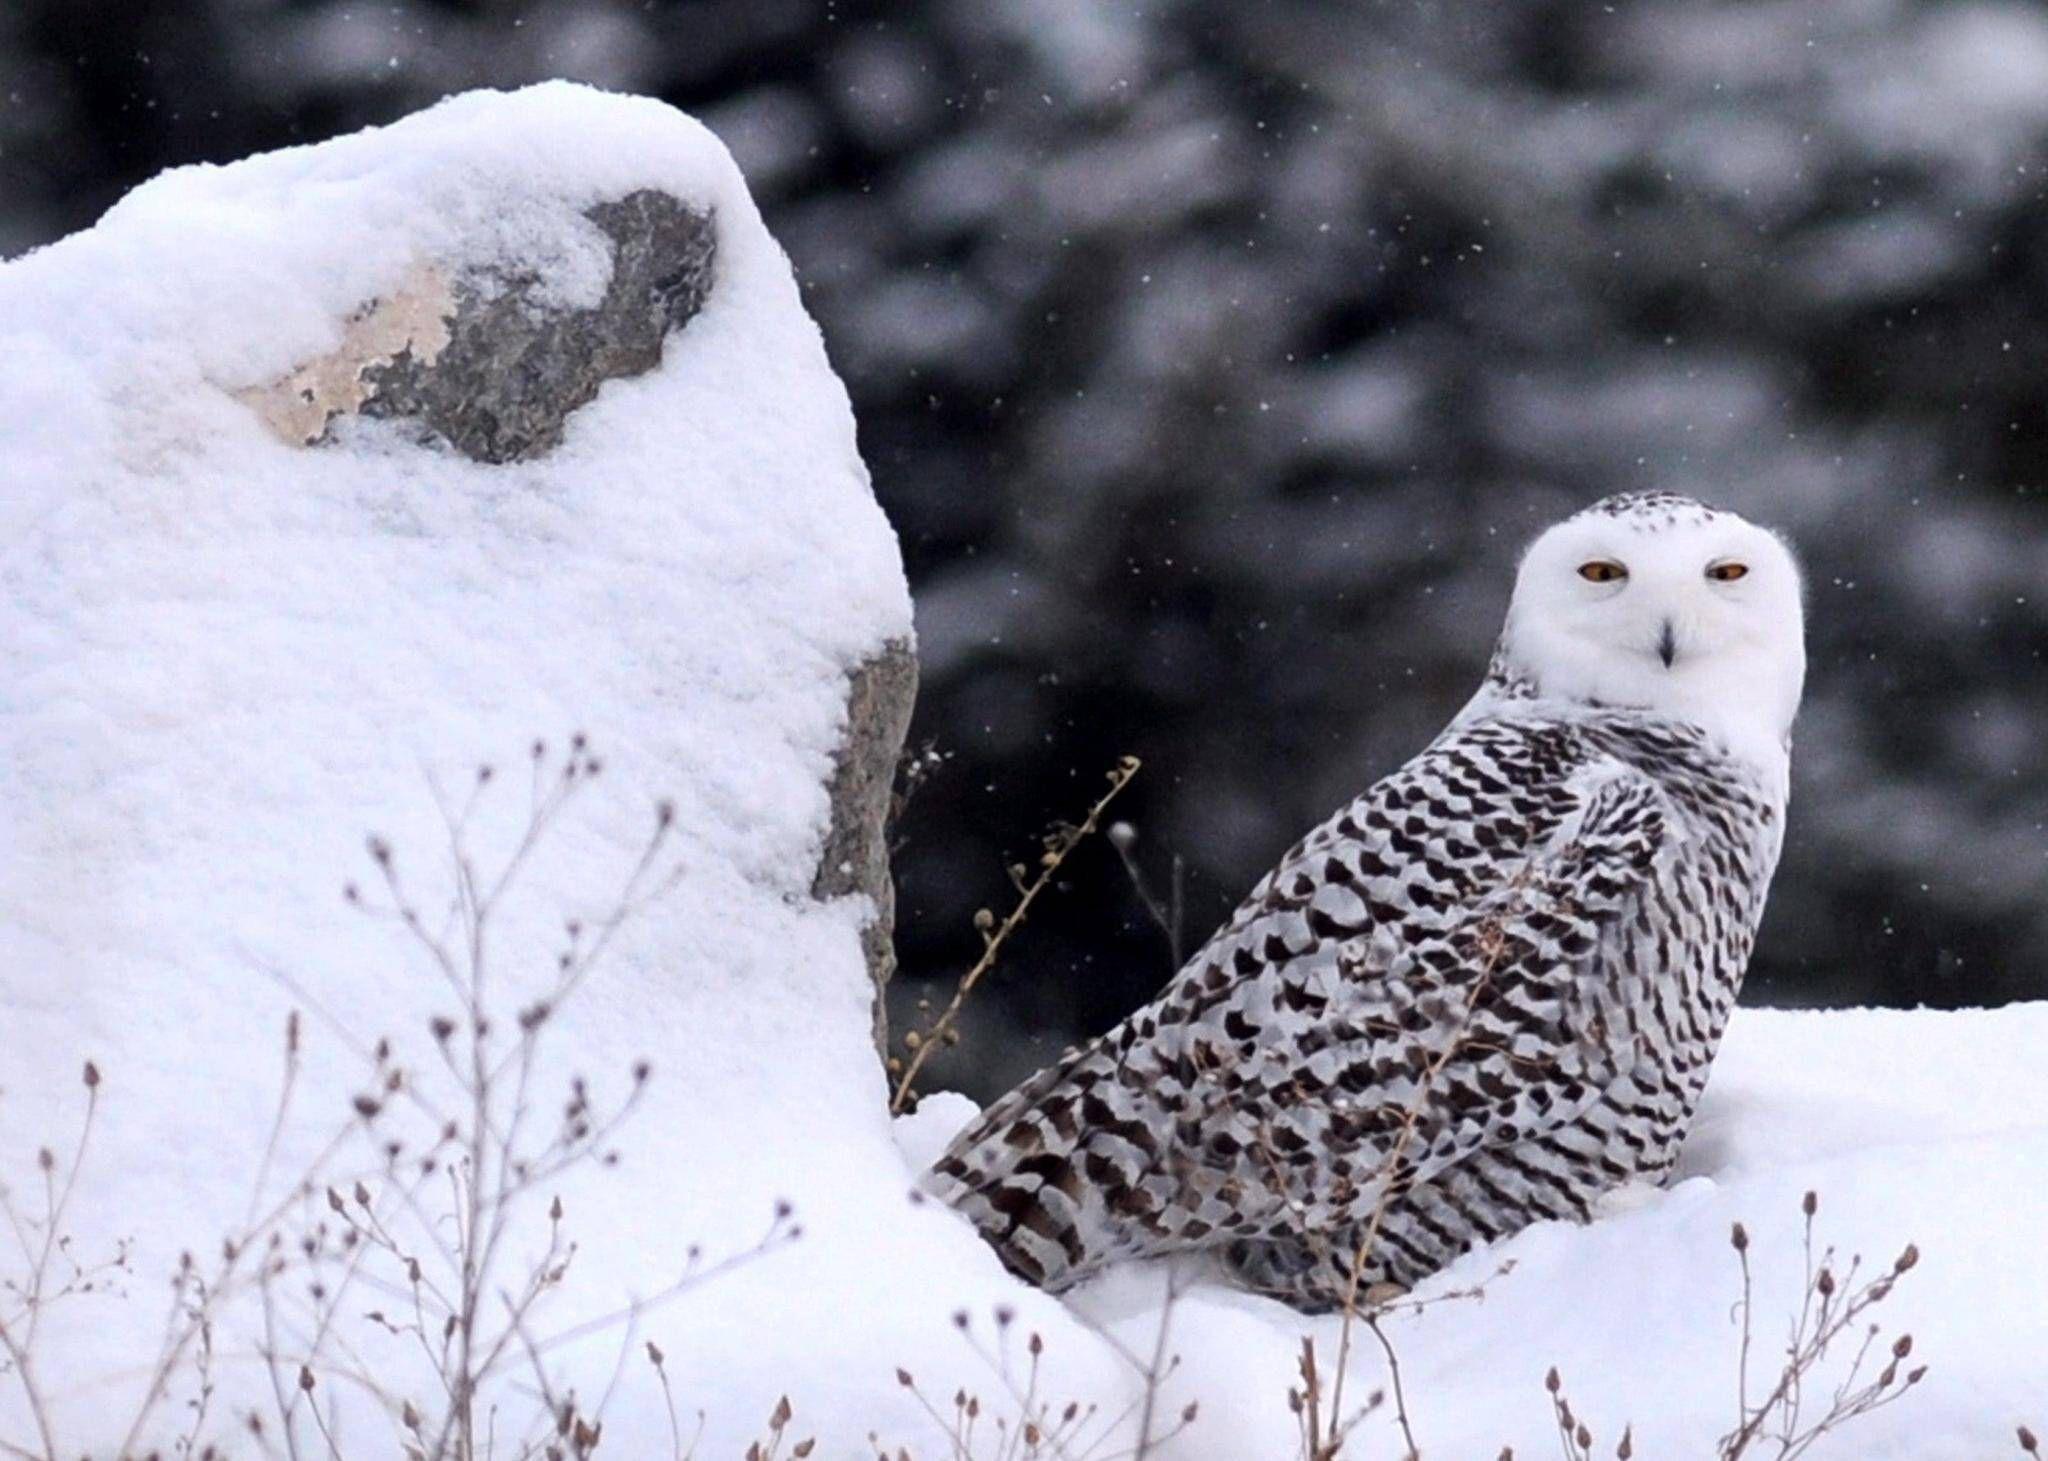 Bird populations in steep decline in North America, study